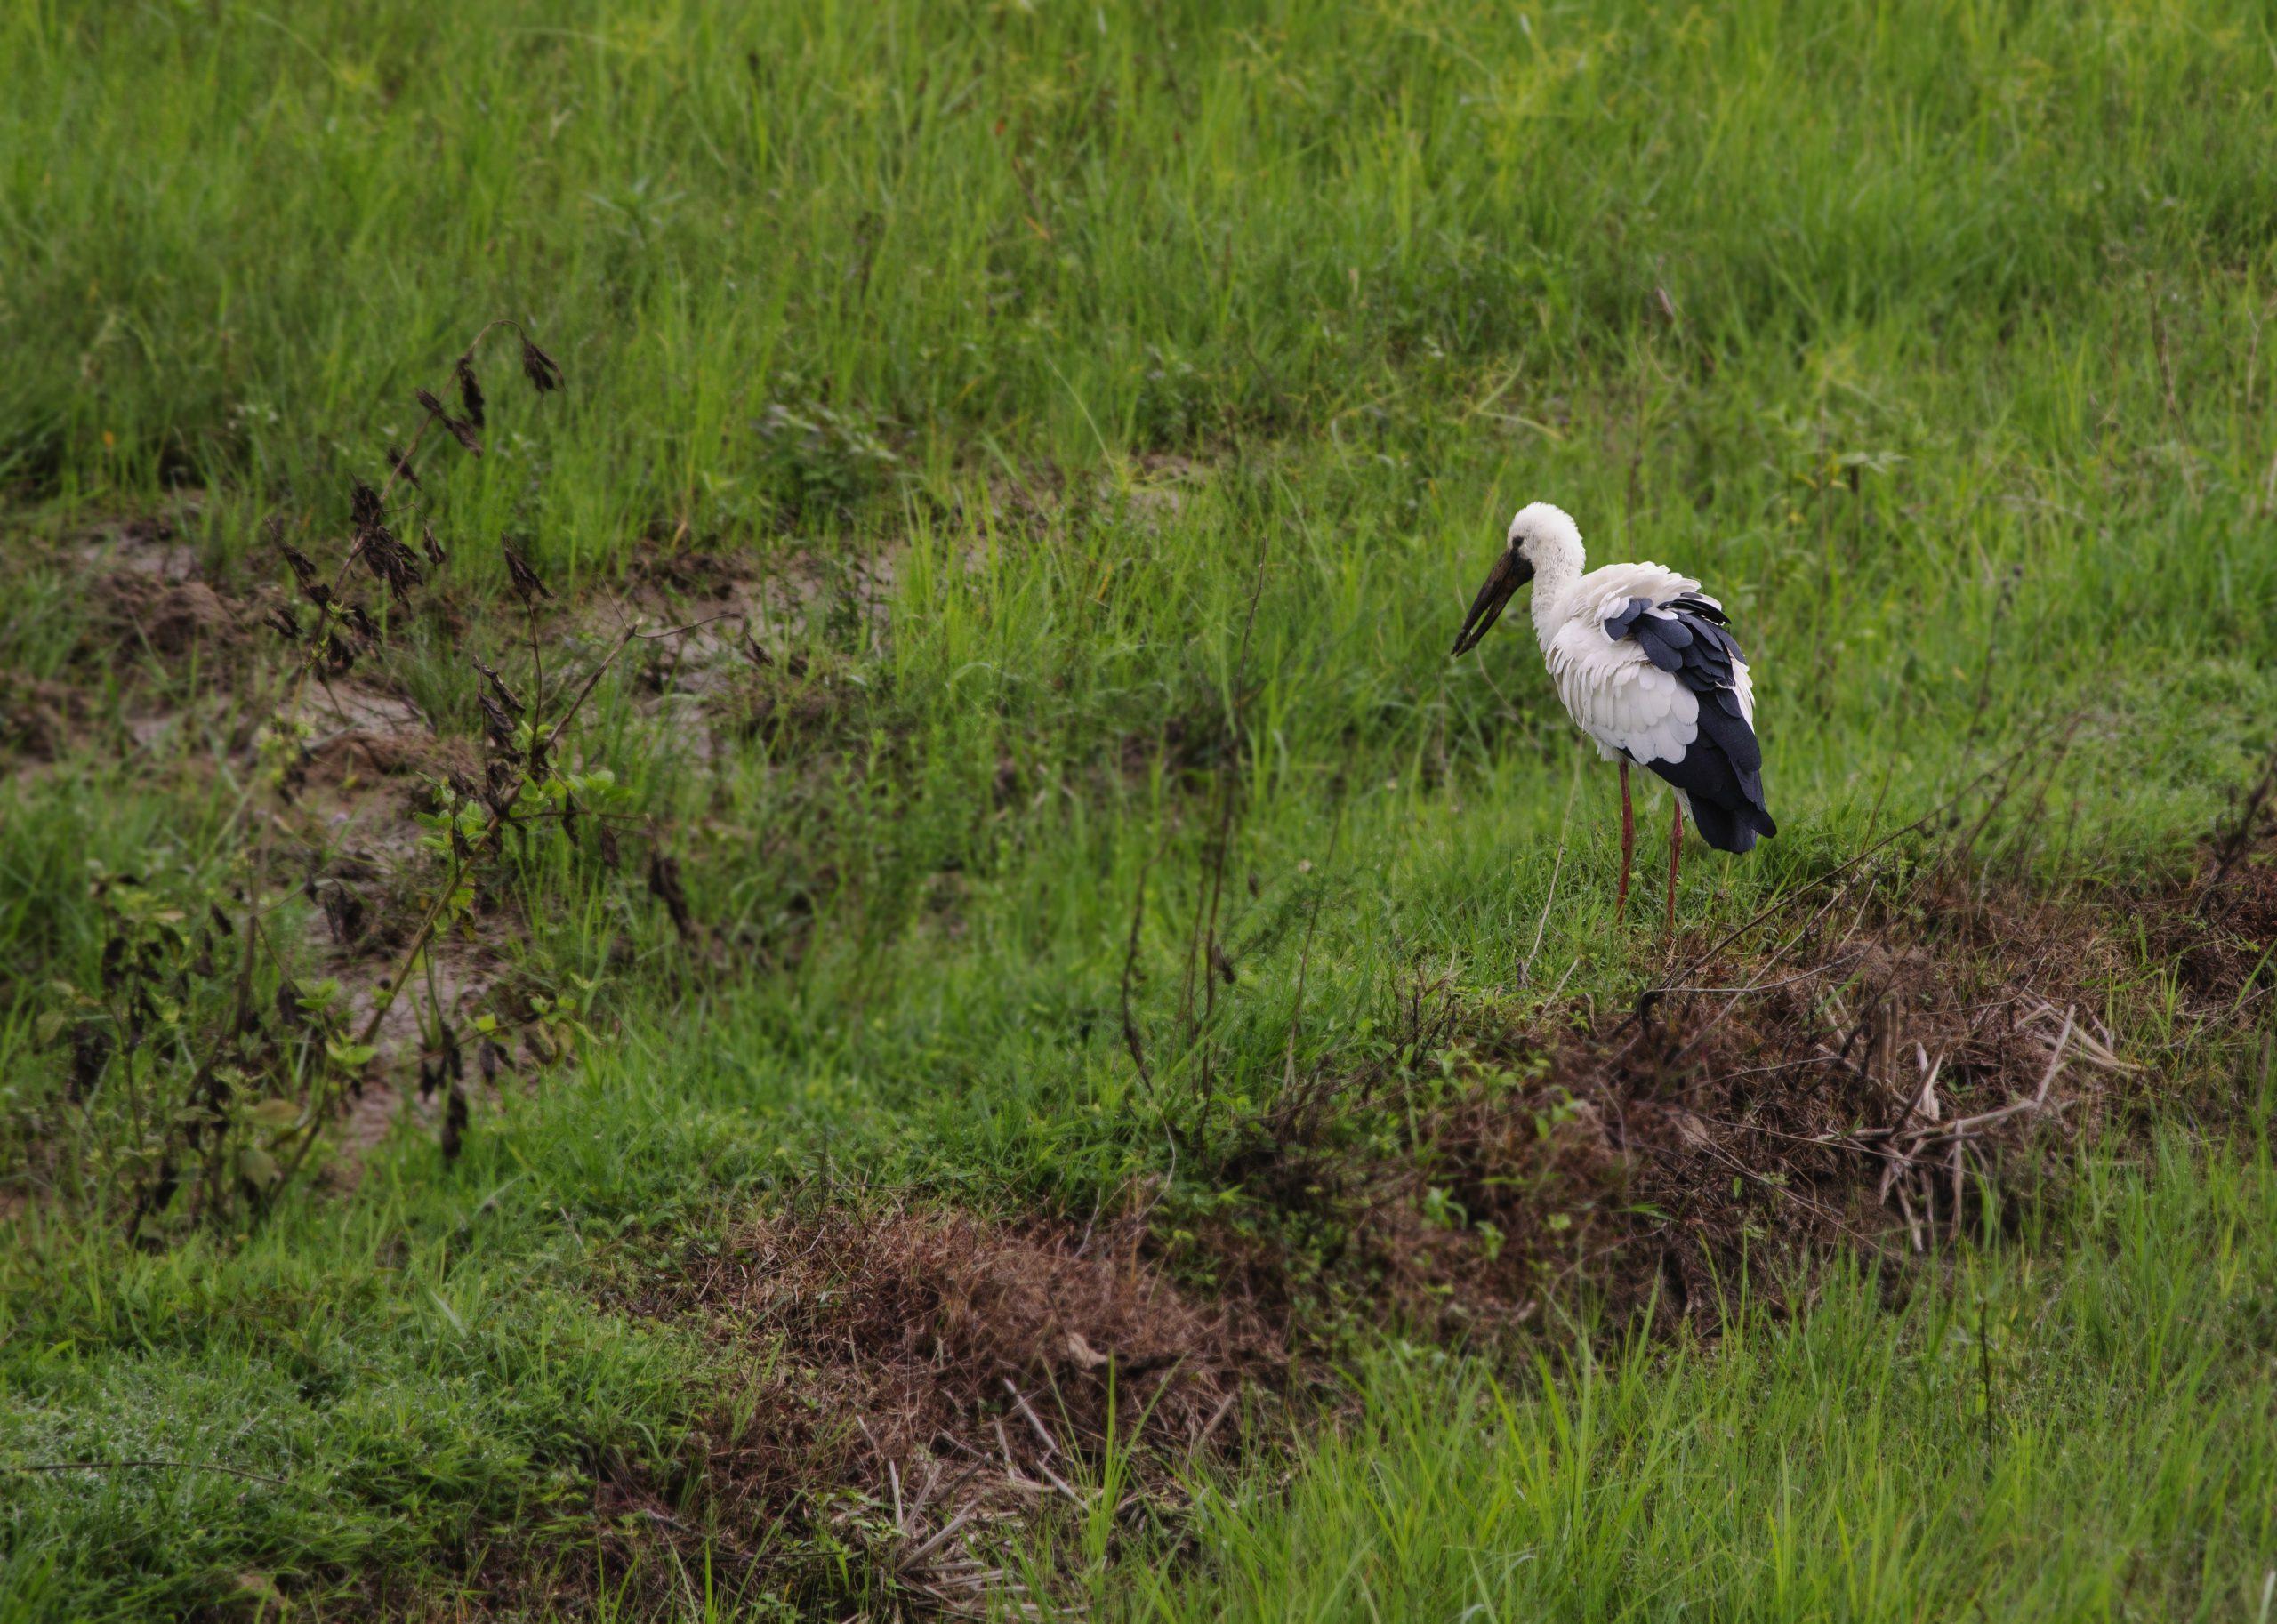 A stork on a field